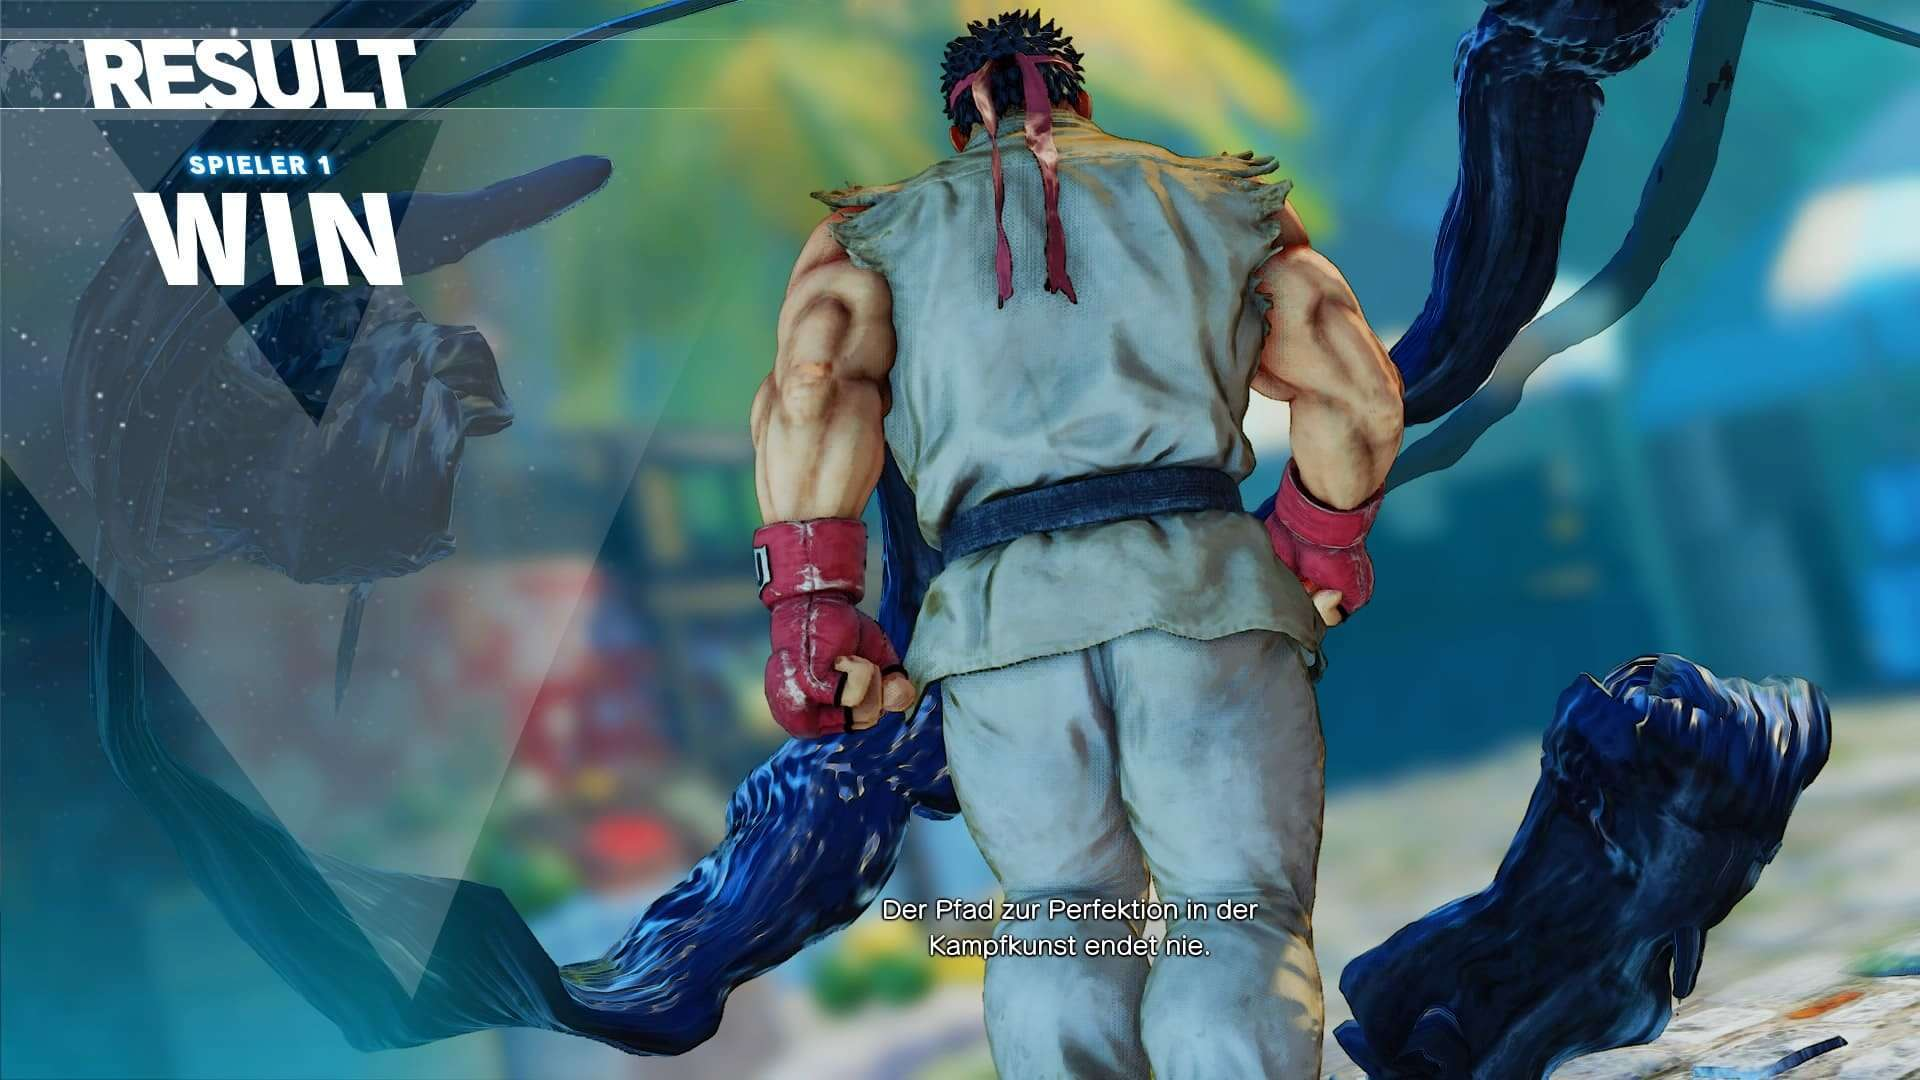 Hadoken strikes again – Street Fighter V (PS4) kurz angespielt 25 techboys.de • smarte News, auf den Punkt! Hadoken strikes again – Street Fighter V (PS4) kurz angespielt